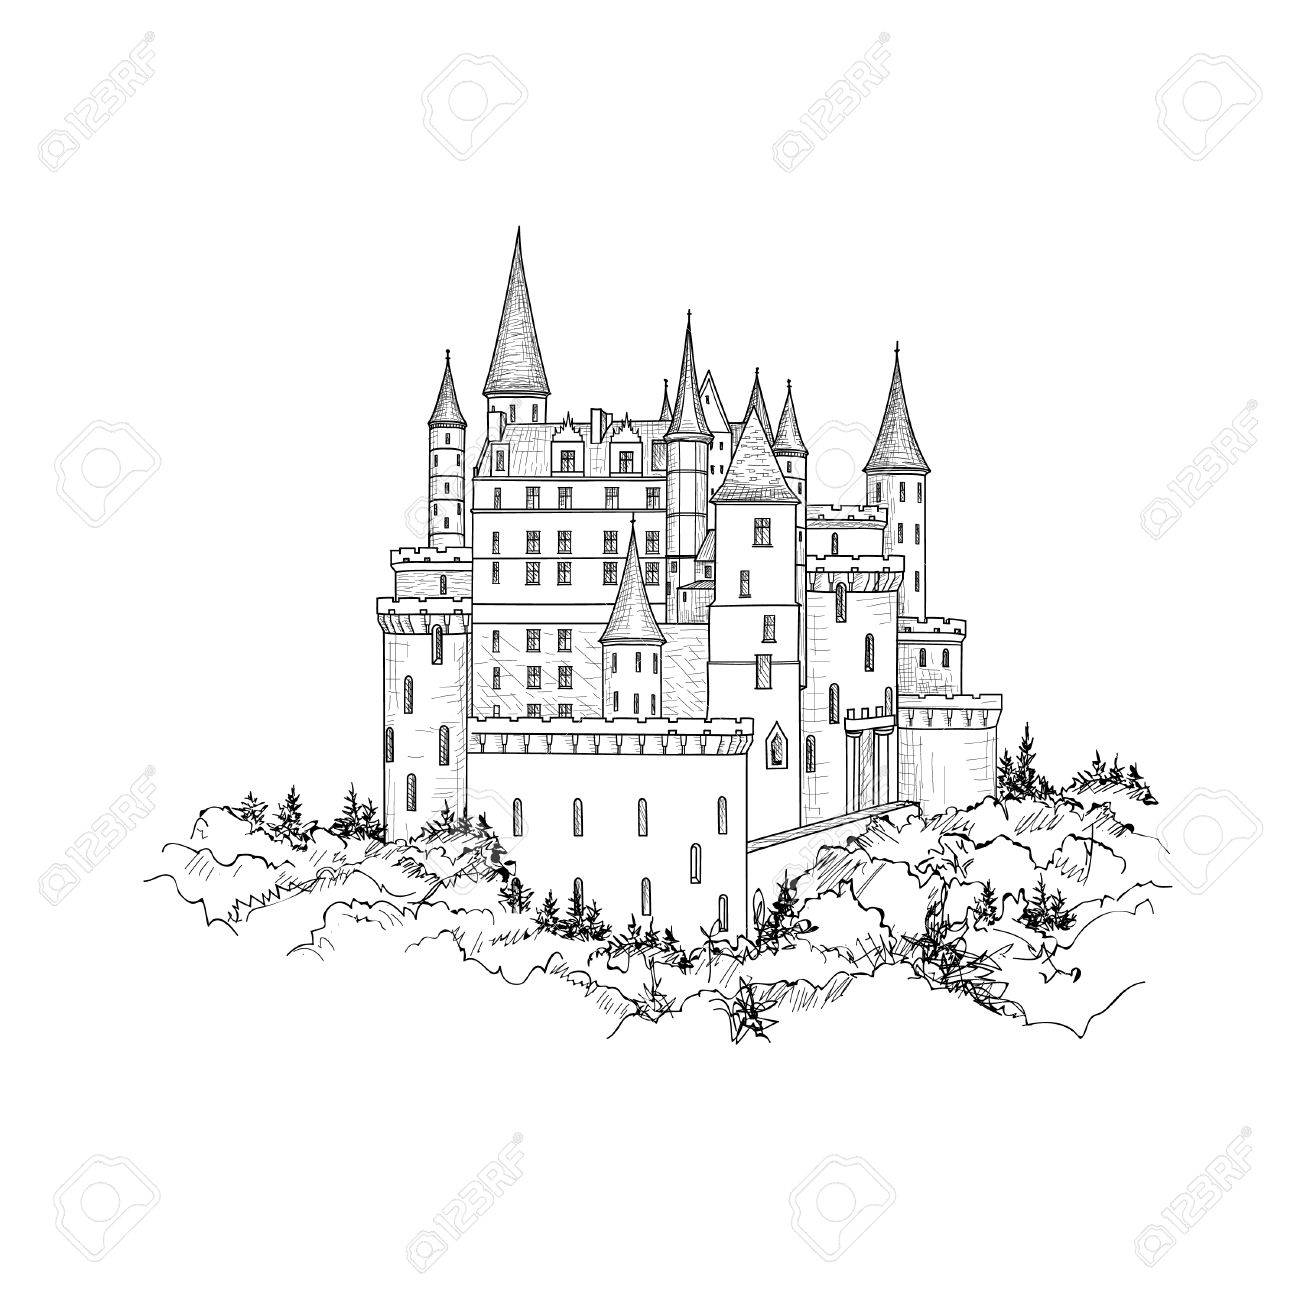 Famous Castle Landscape. Travel Background. Castle building on the hill skyline etching. Hand drawn sketch - 69902448